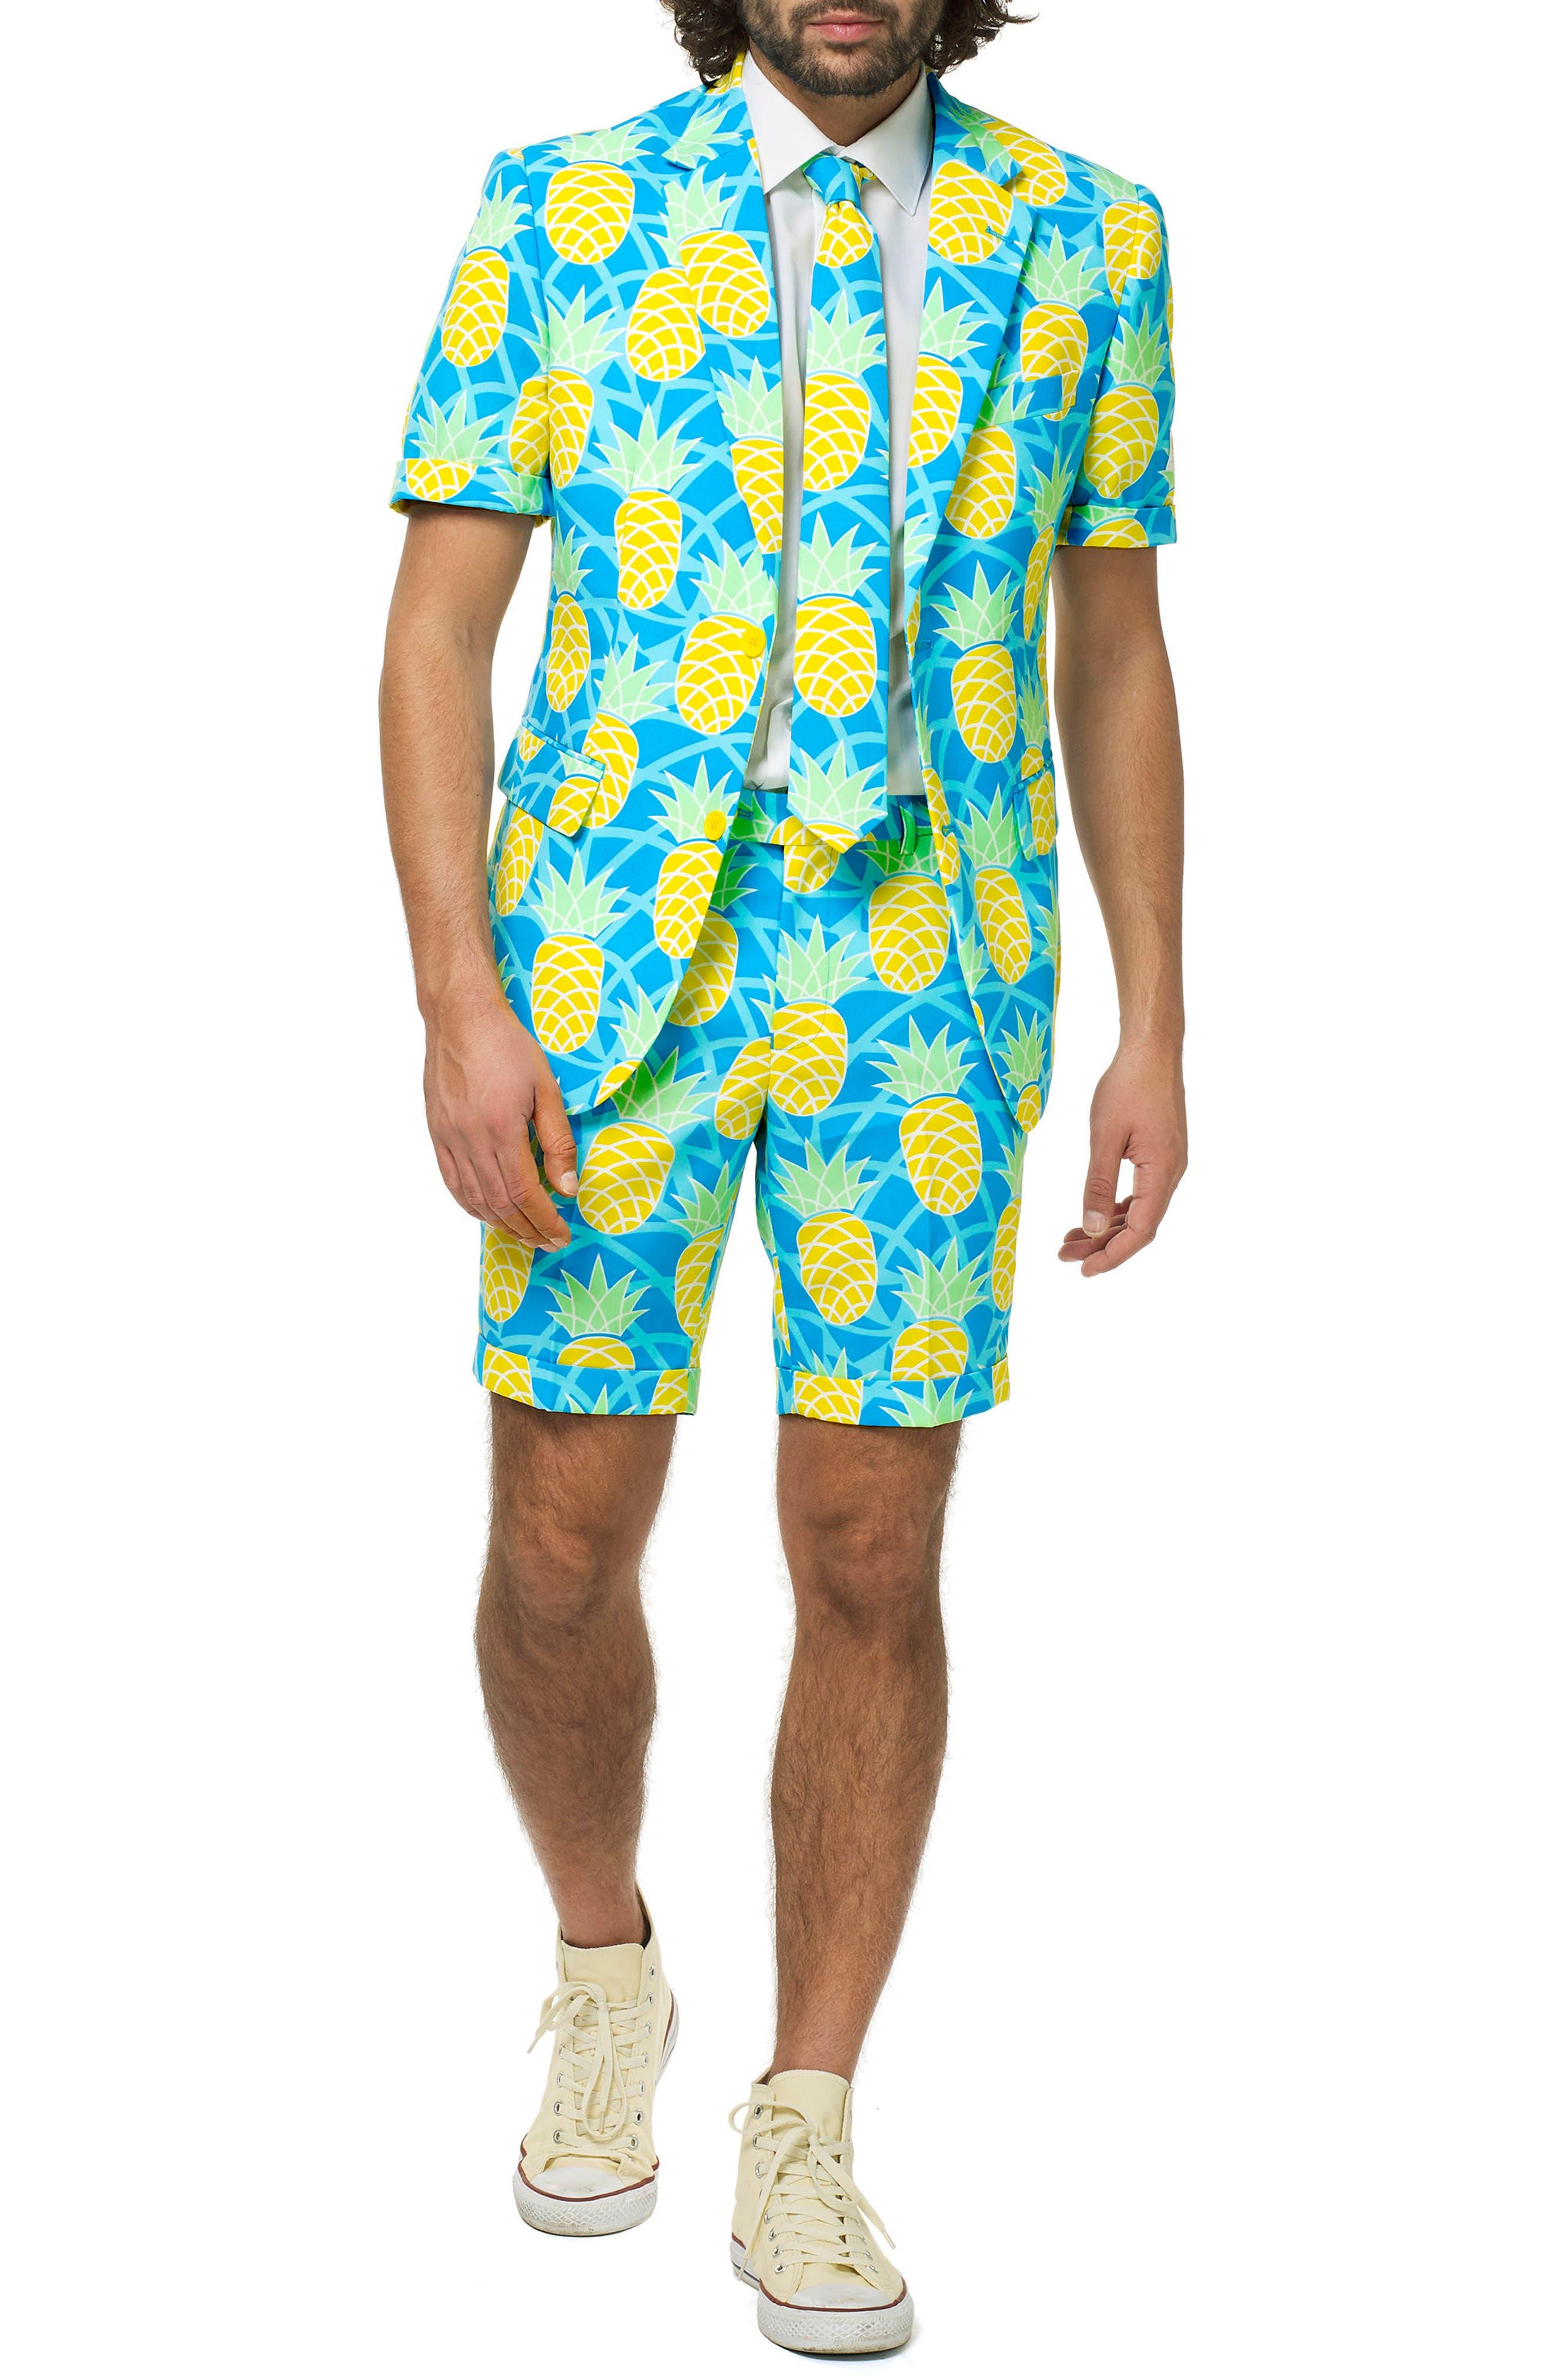 Shineapple Trim Fit Two-Piece Short Suit with Tie,                             Main thumbnail 1, color,                             Miscellaneous